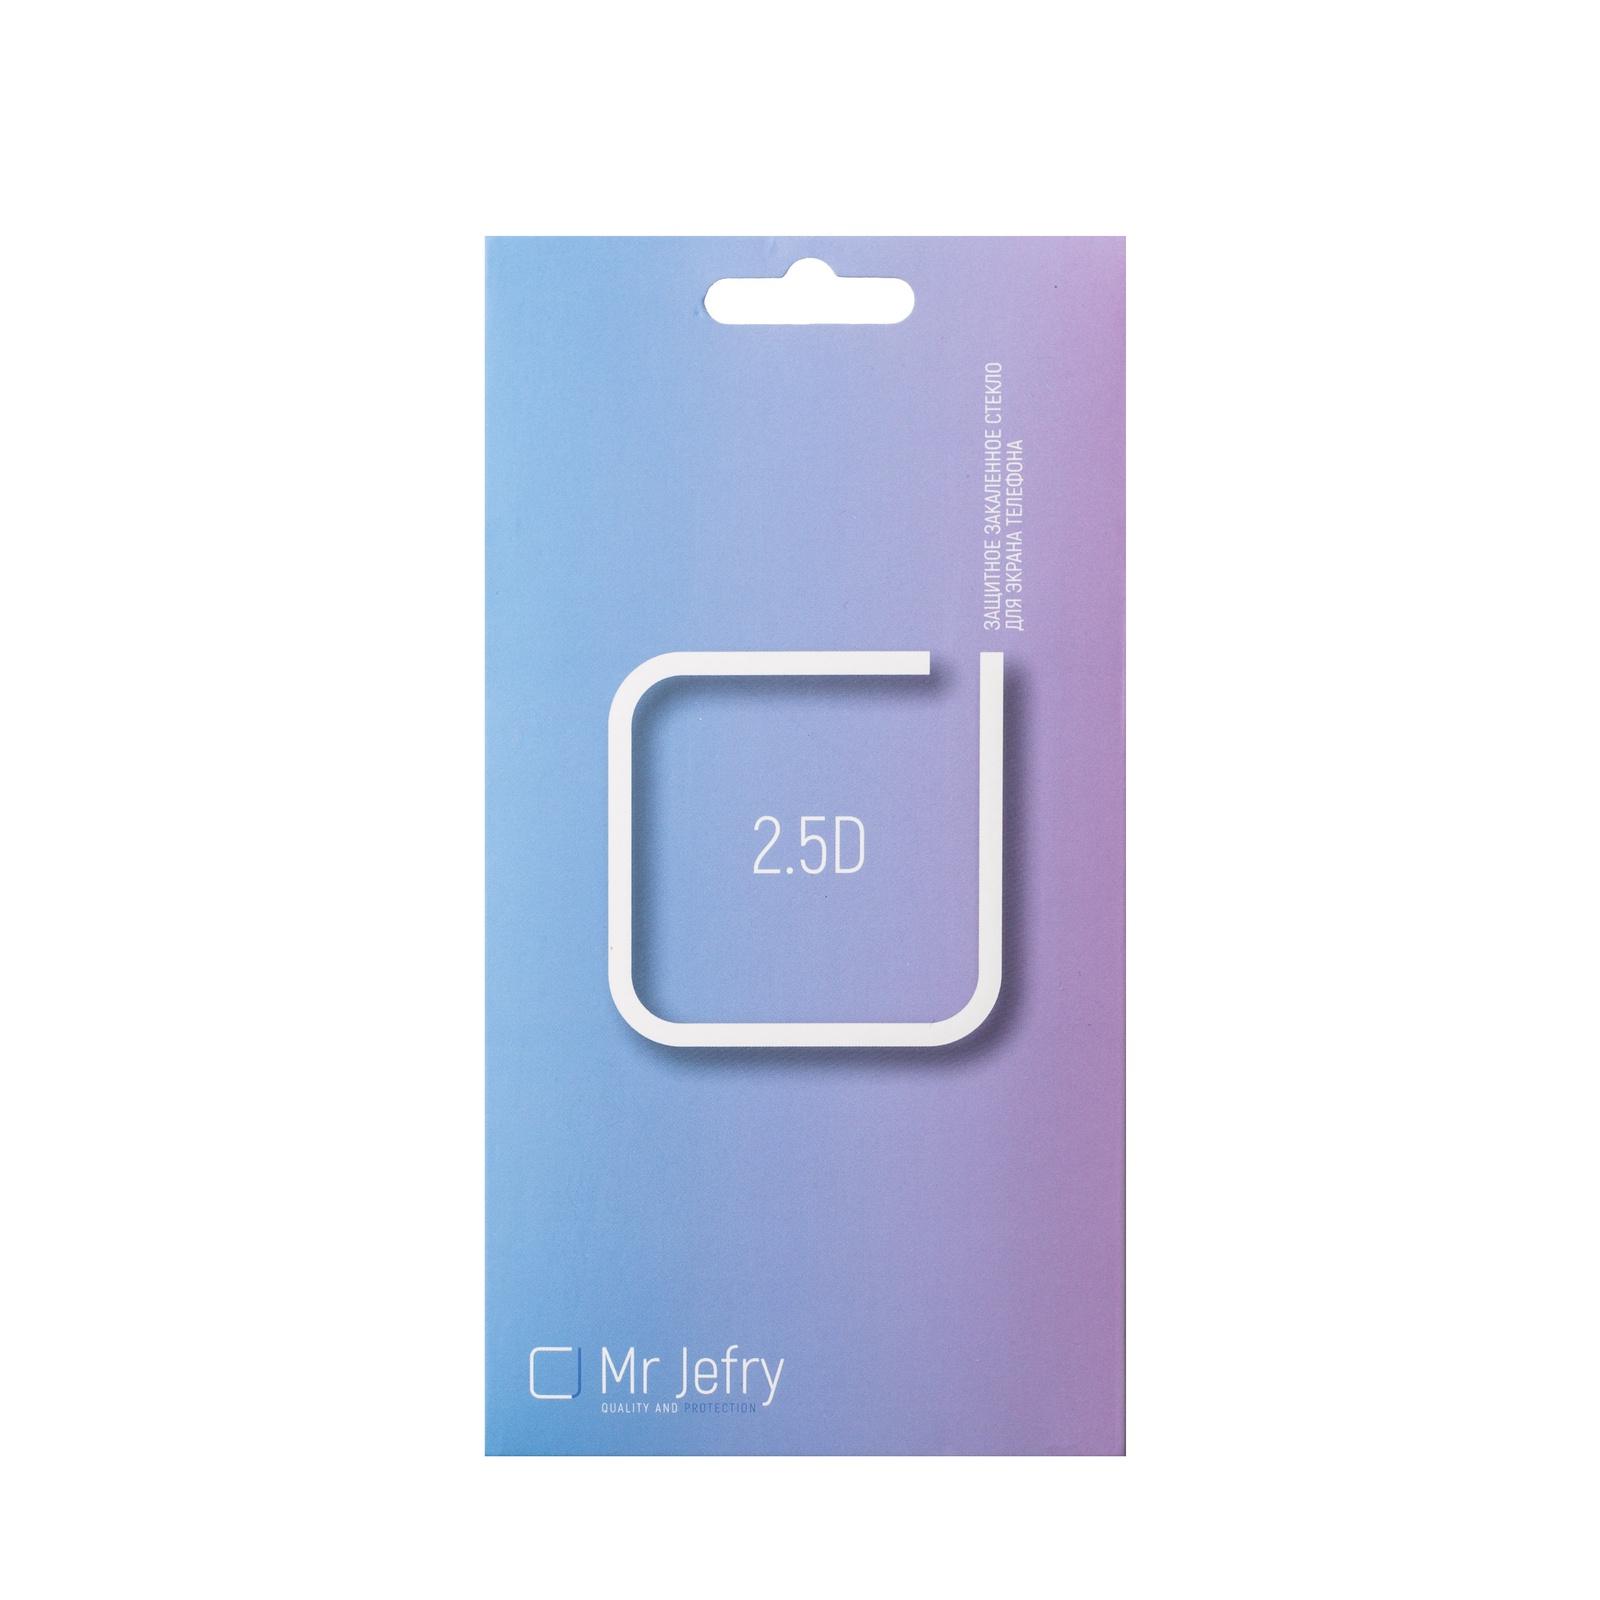 Mr Jefry стекло защитное (многослойное) 2,5D для IPhone xs max